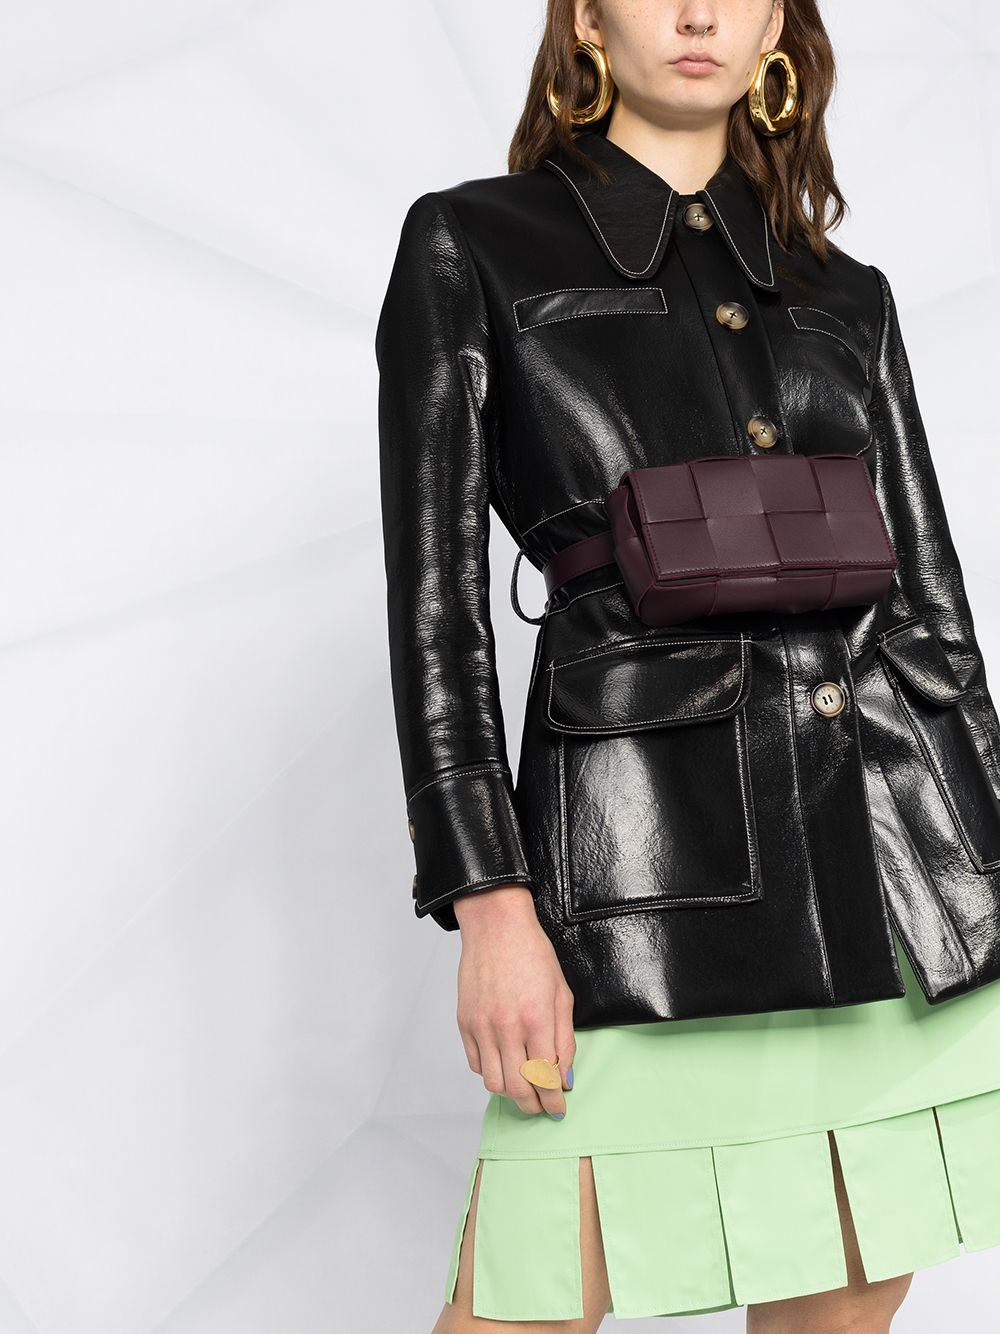 Pistachio mini skirt featuring cut-out edge BOTTEGA VENETA |  | 646585-V01N03516